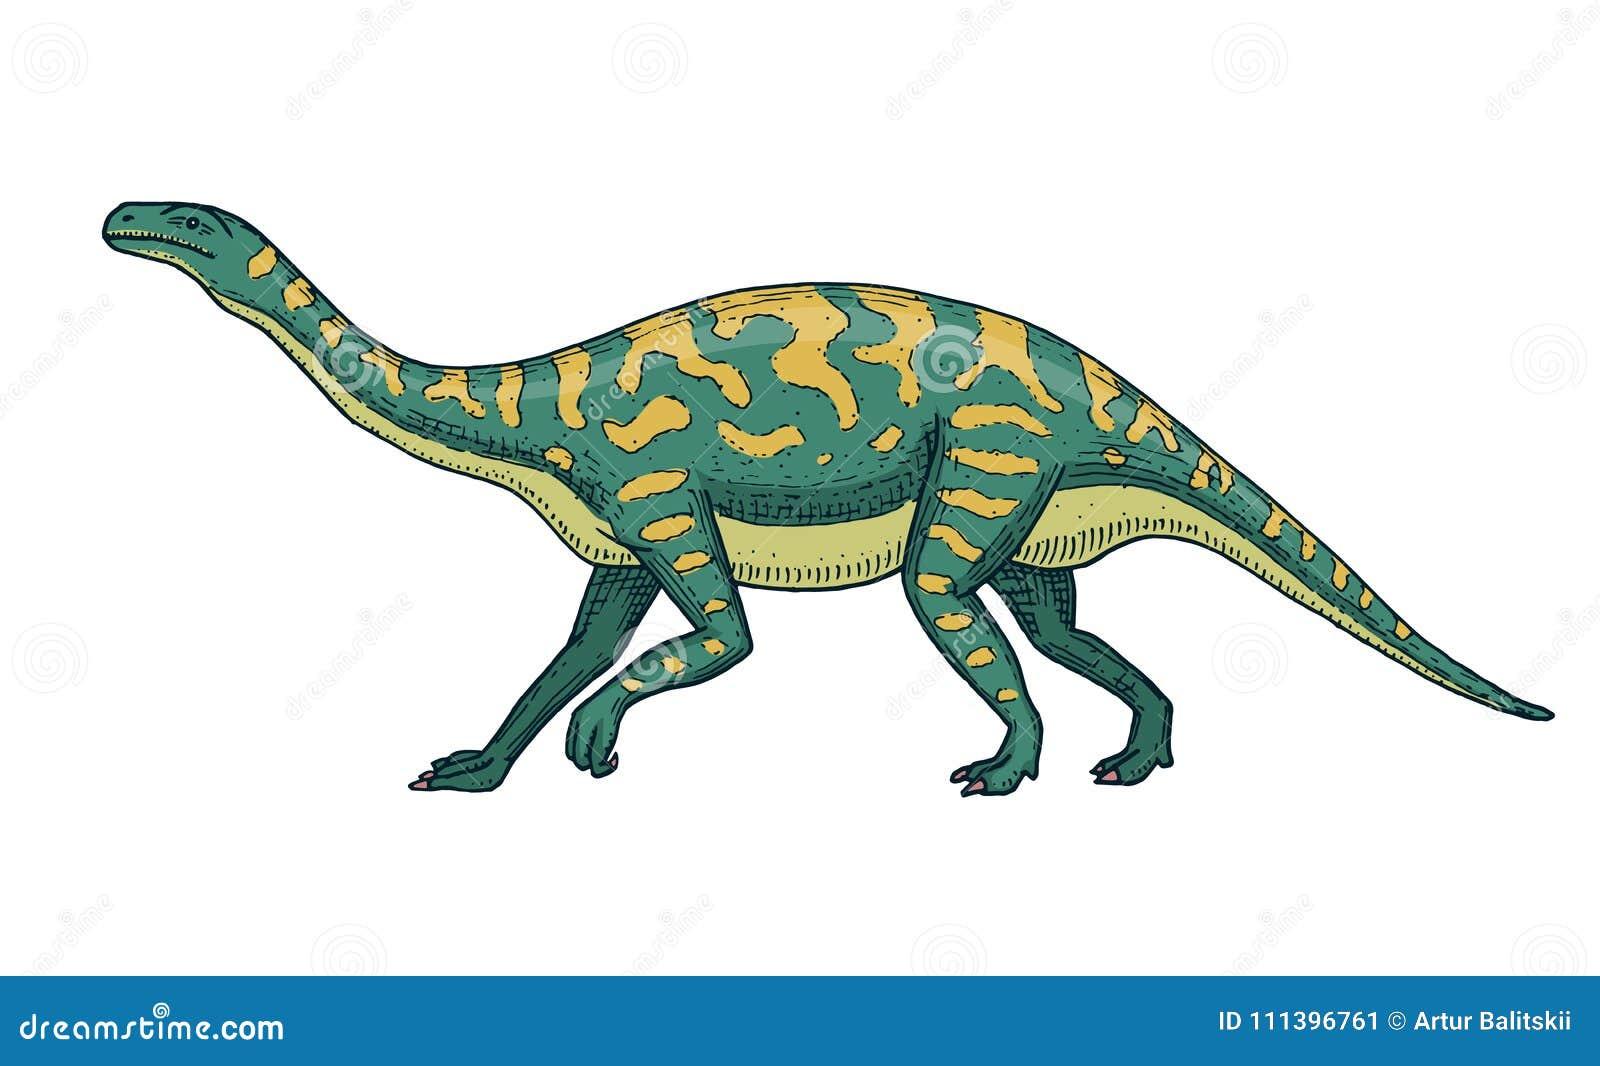 Dinosaurussen Barosaurus, Apatosaurus, Tenontosaurus Plateosaurus, brede hagedis, Massospondylus, Diplodocus, Brachiosaurus